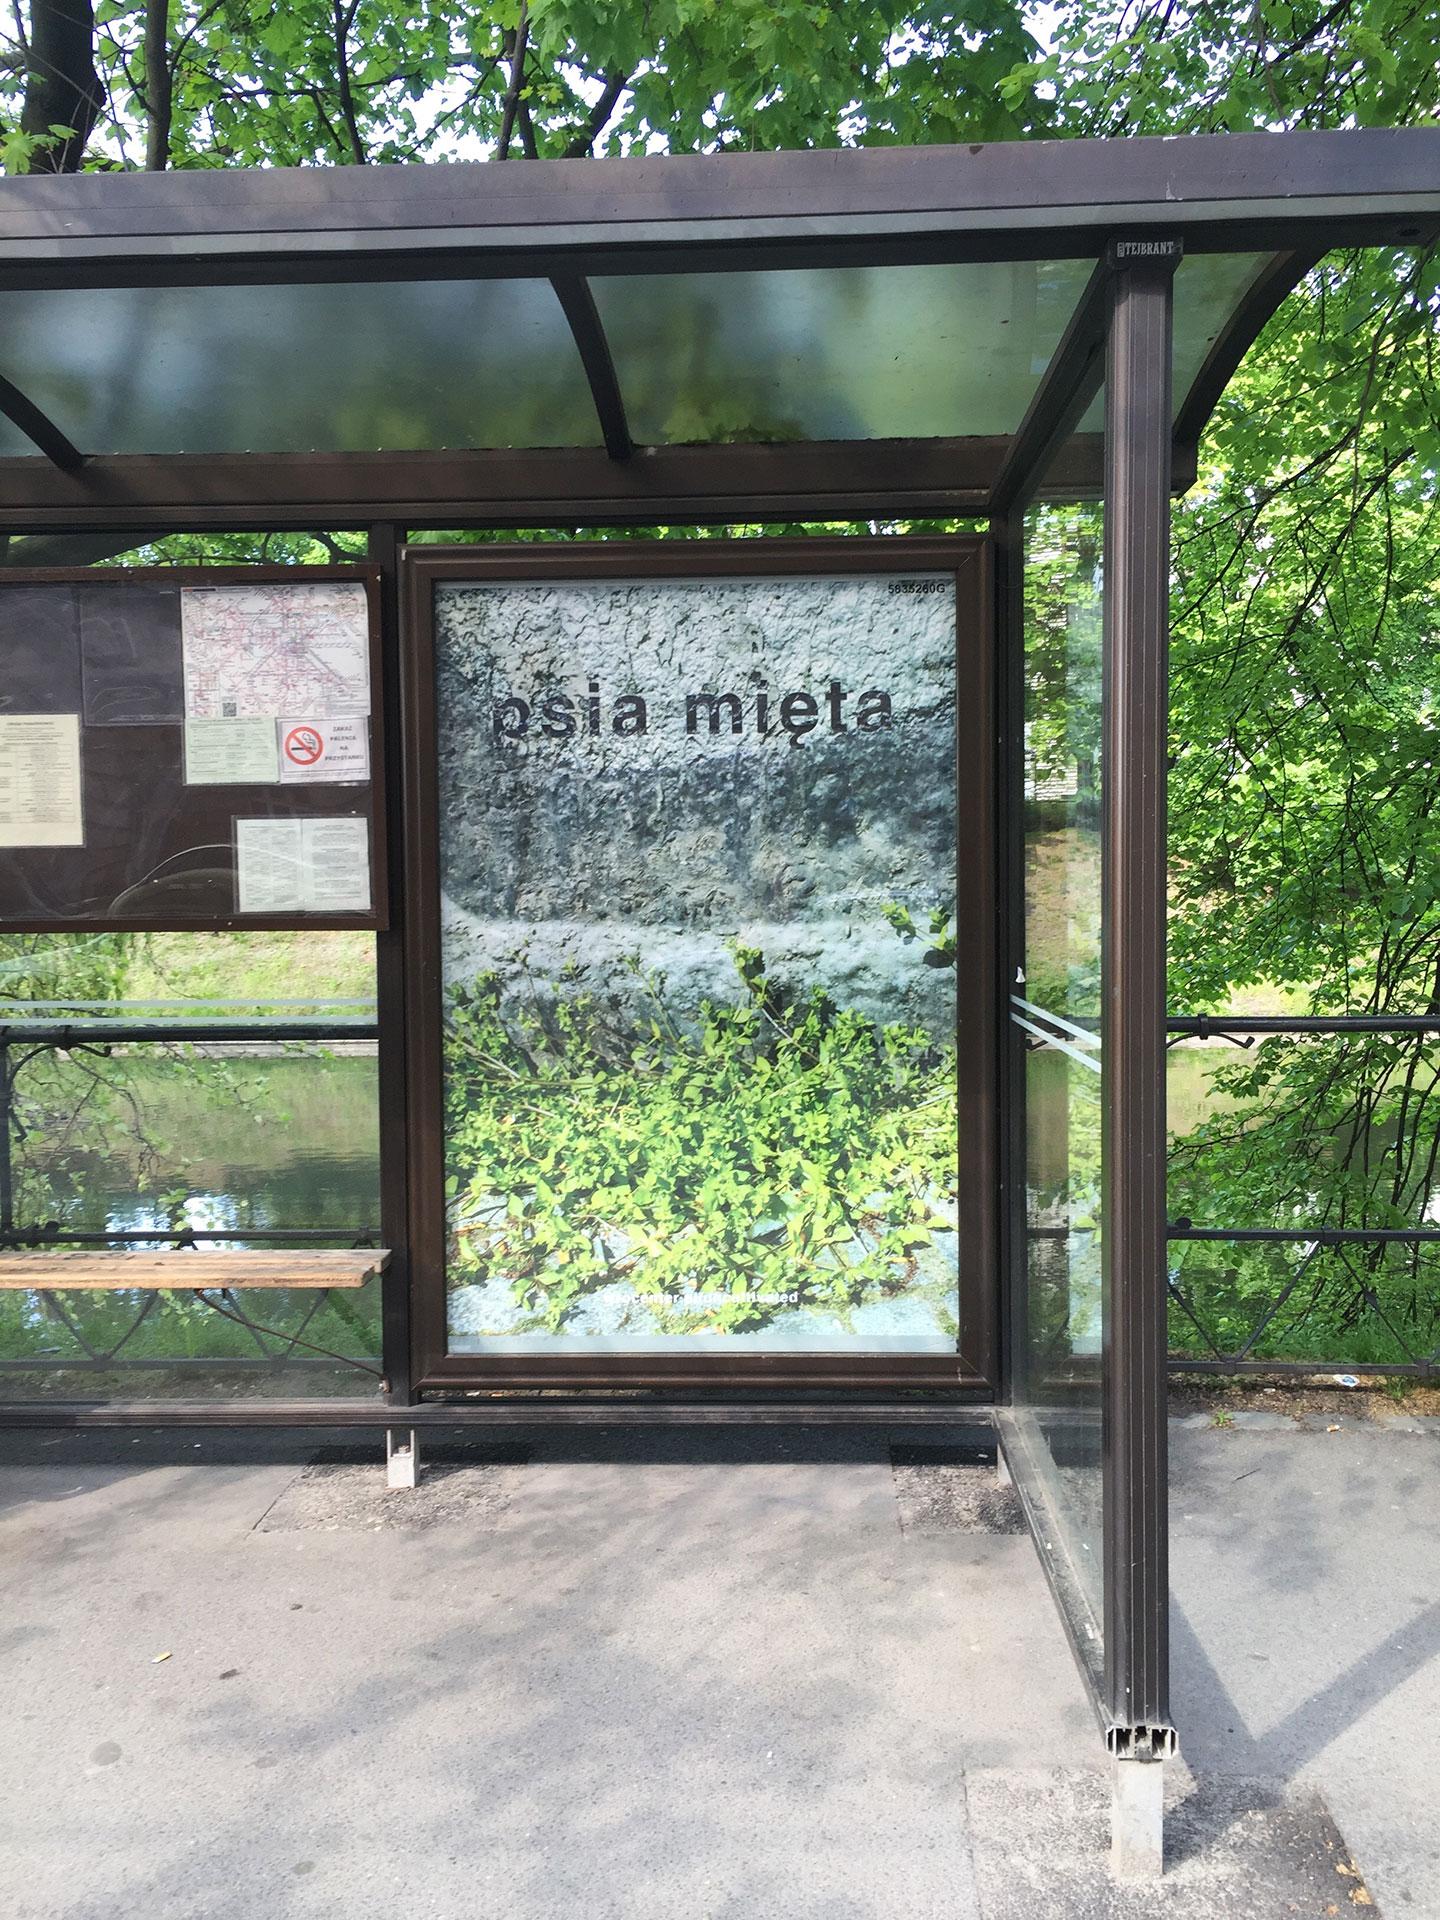 Transit shelter poster